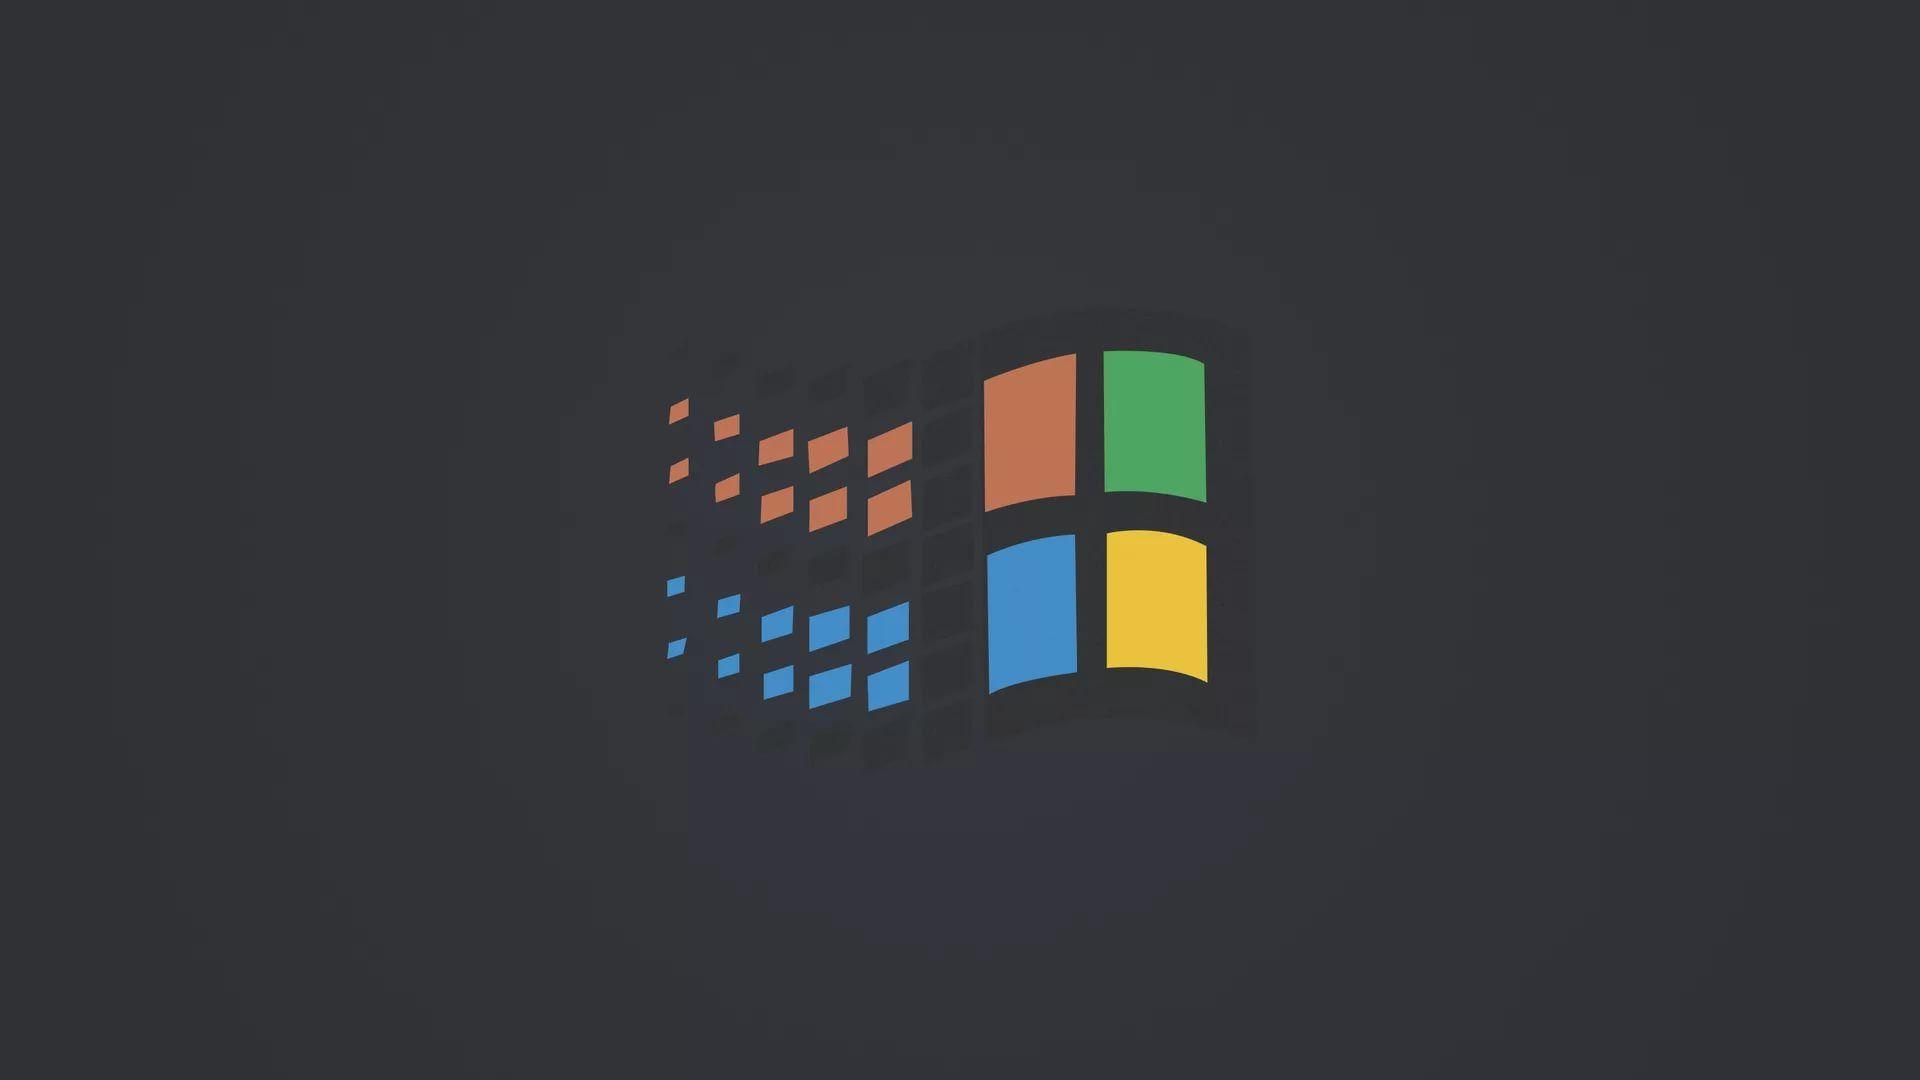 Windows Free Wallpaper